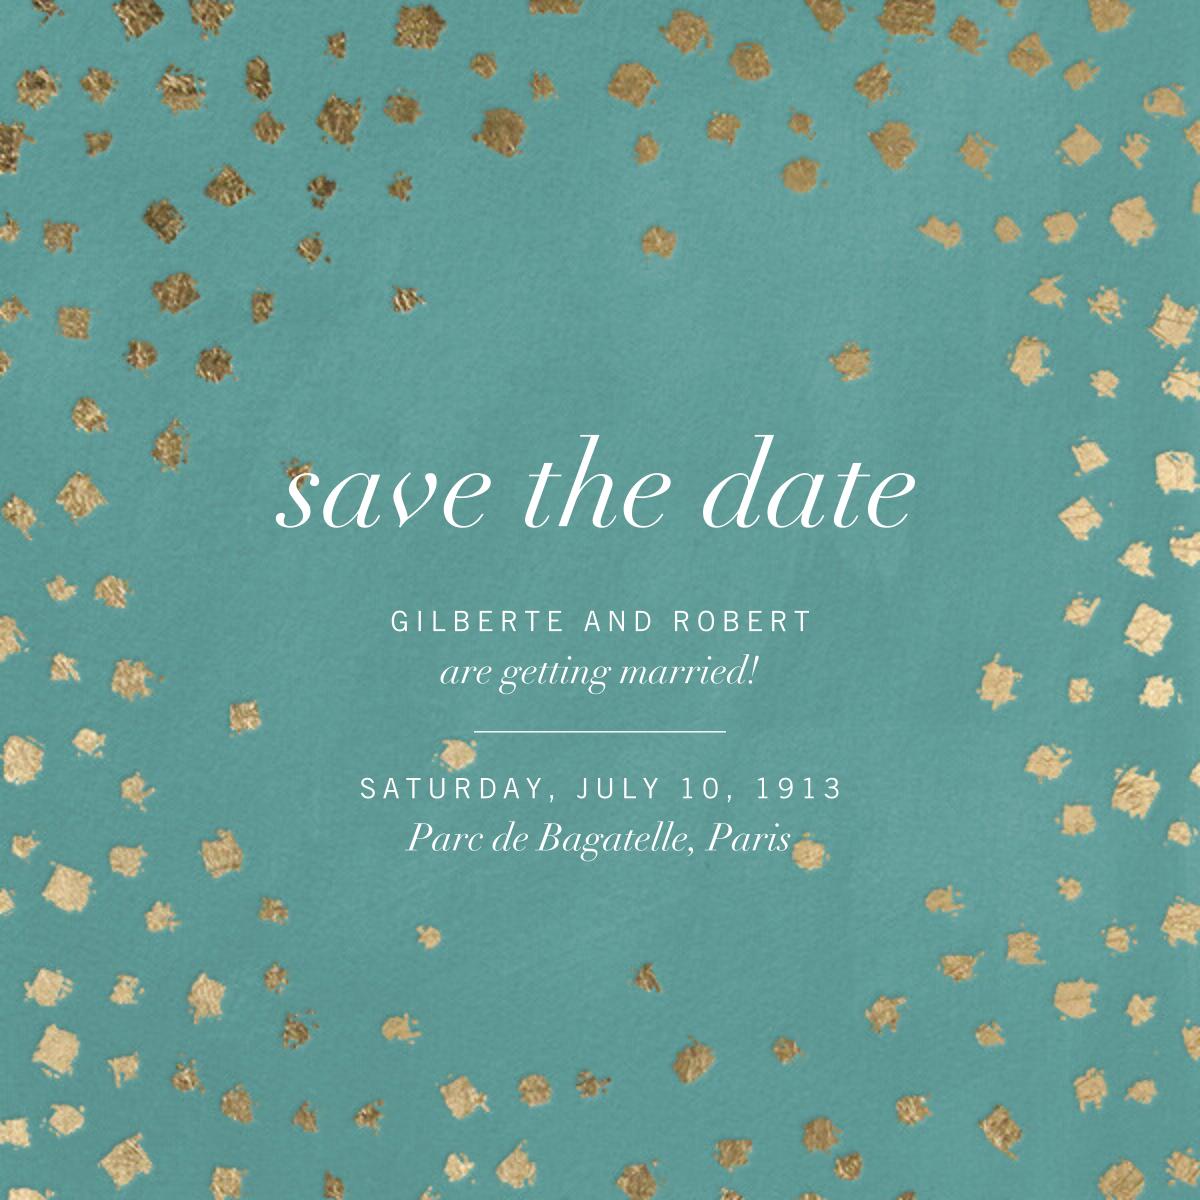 Divot - Amazon - Kelly Wearstler - Save the date